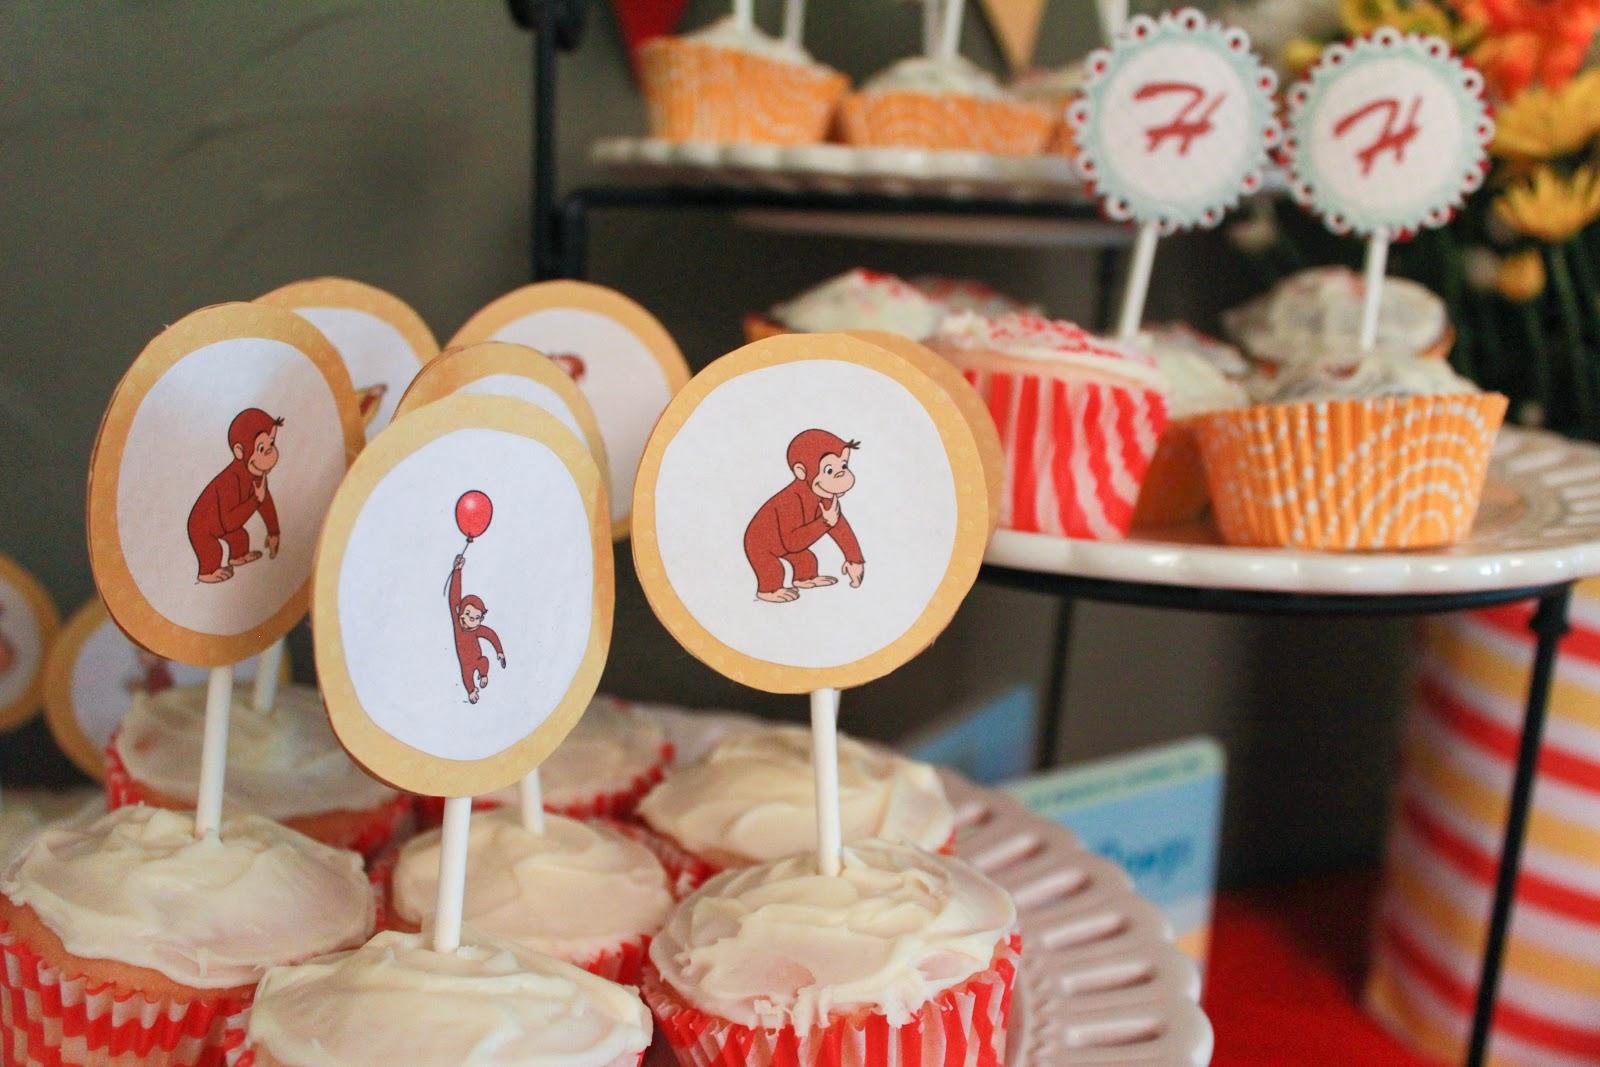 http://2.bp.blogspot.com/-yg4f4cvLbLc/UUoTQ-NrxqI/AAAAAAAAAS8/ZrsQSFlREH0/s1600/1st+birthday+party-8.jpg